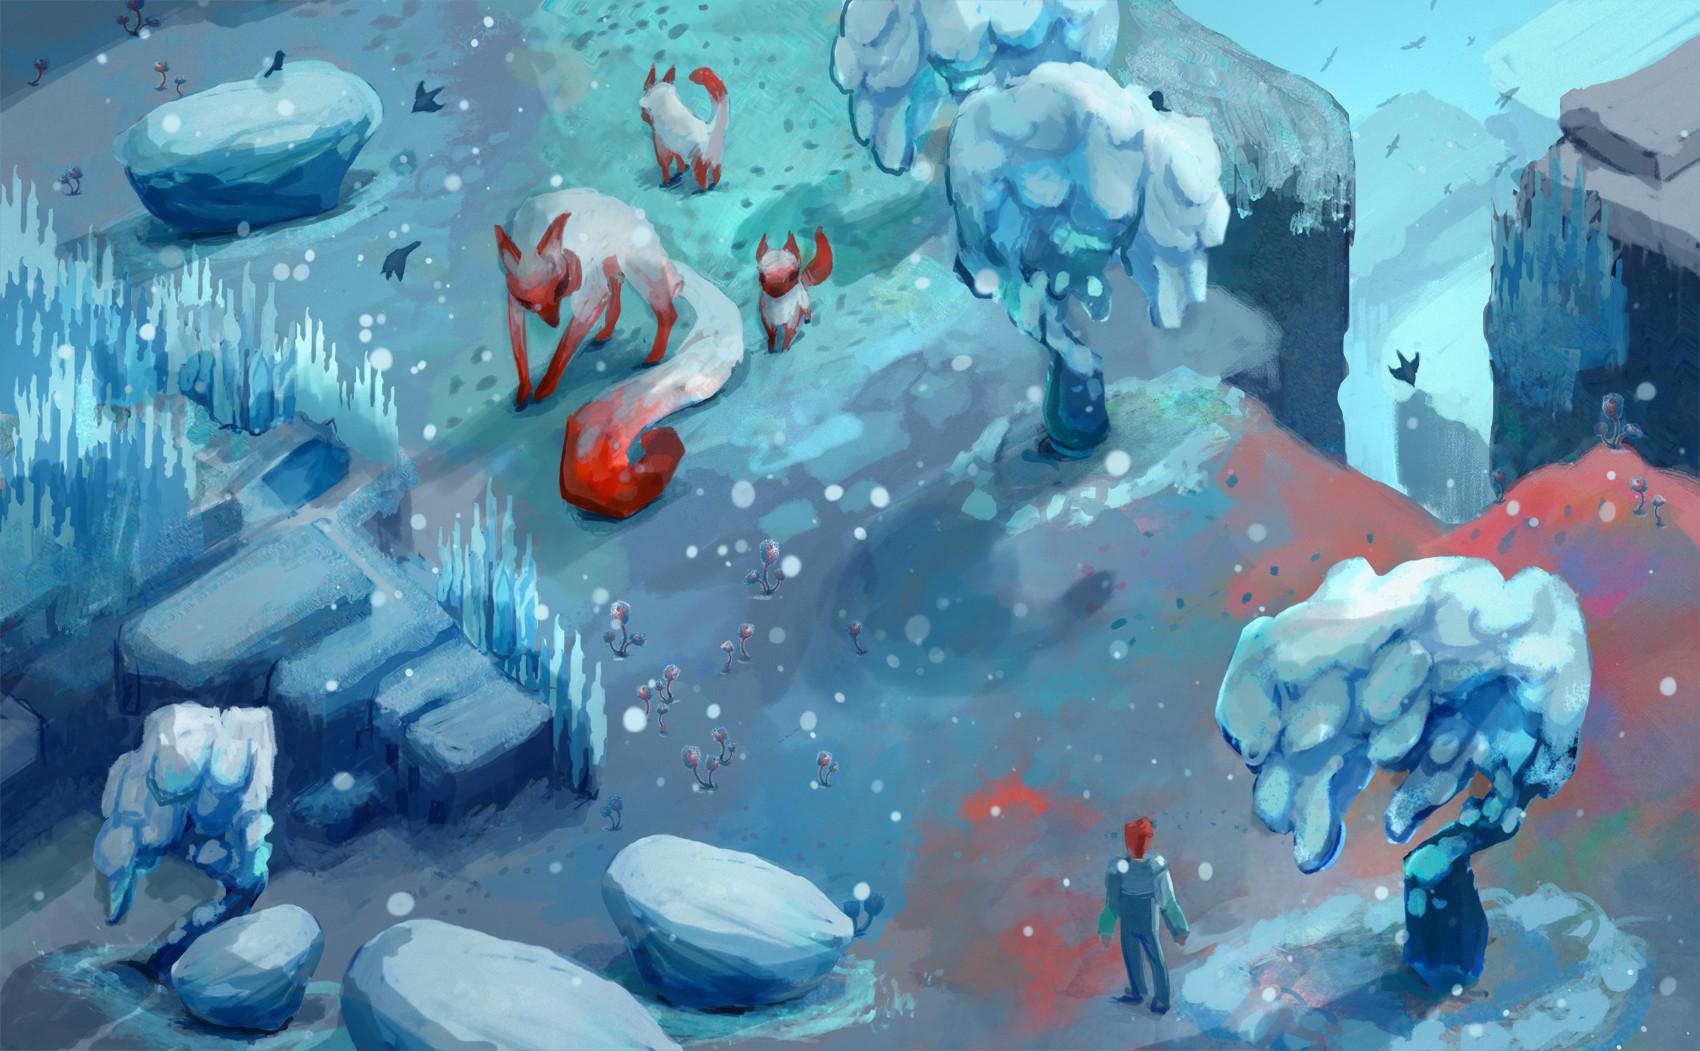 Snow biome